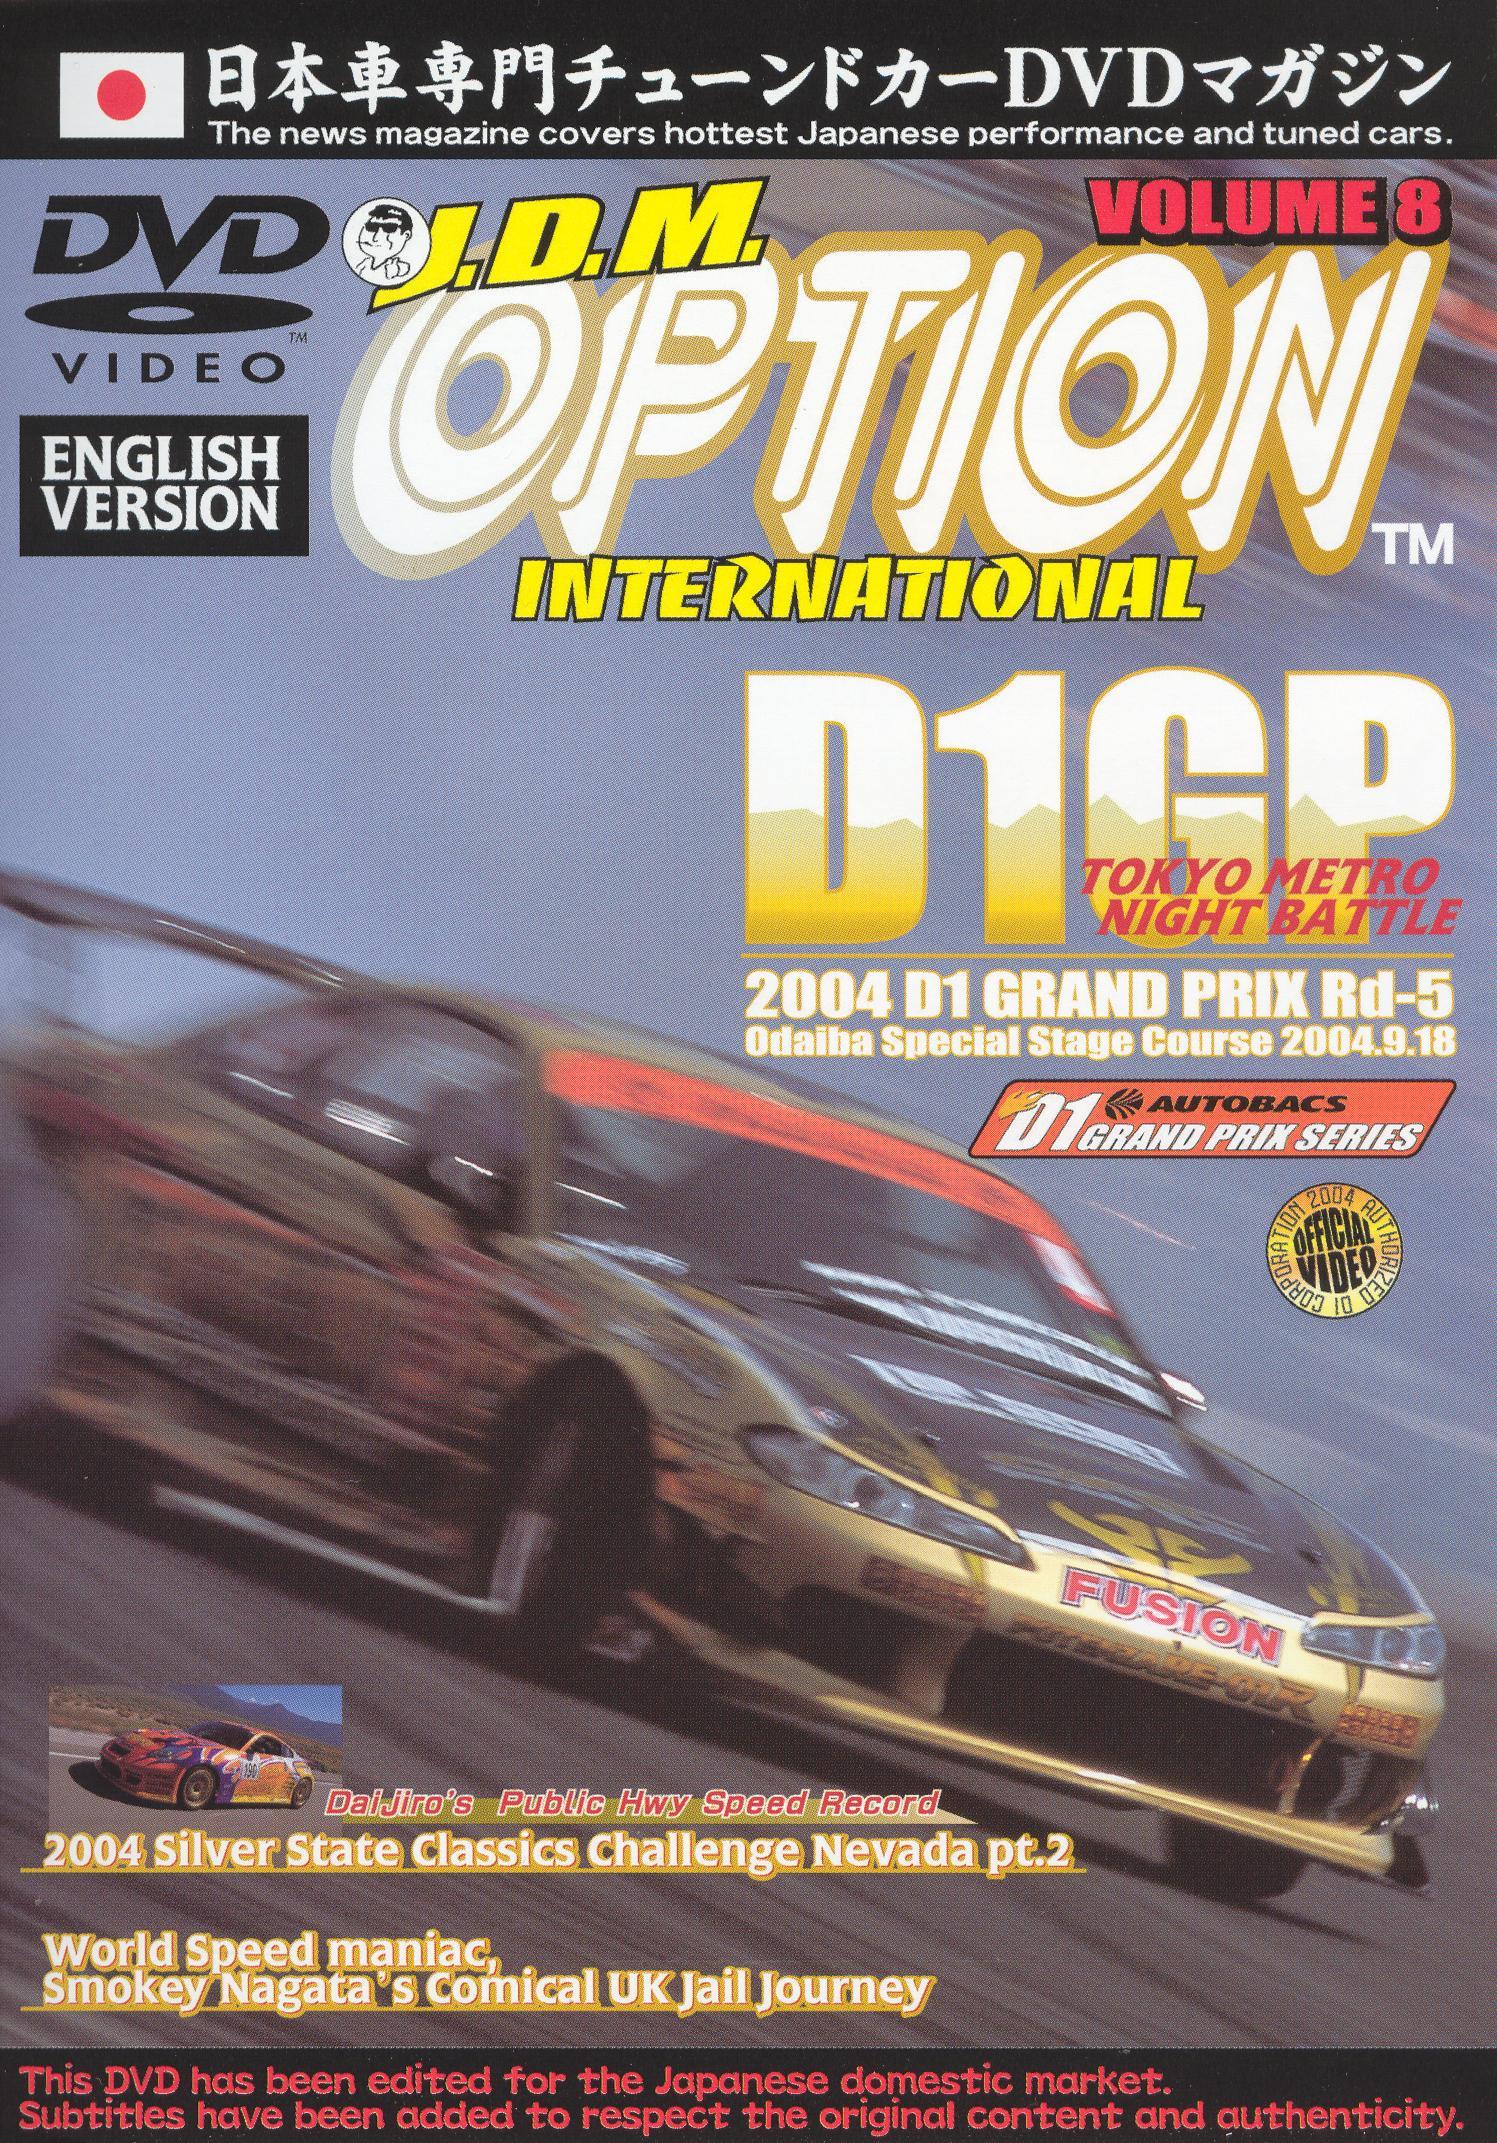 JDM Option, Vol. 8: D1 Tokyo Metro Night Drift